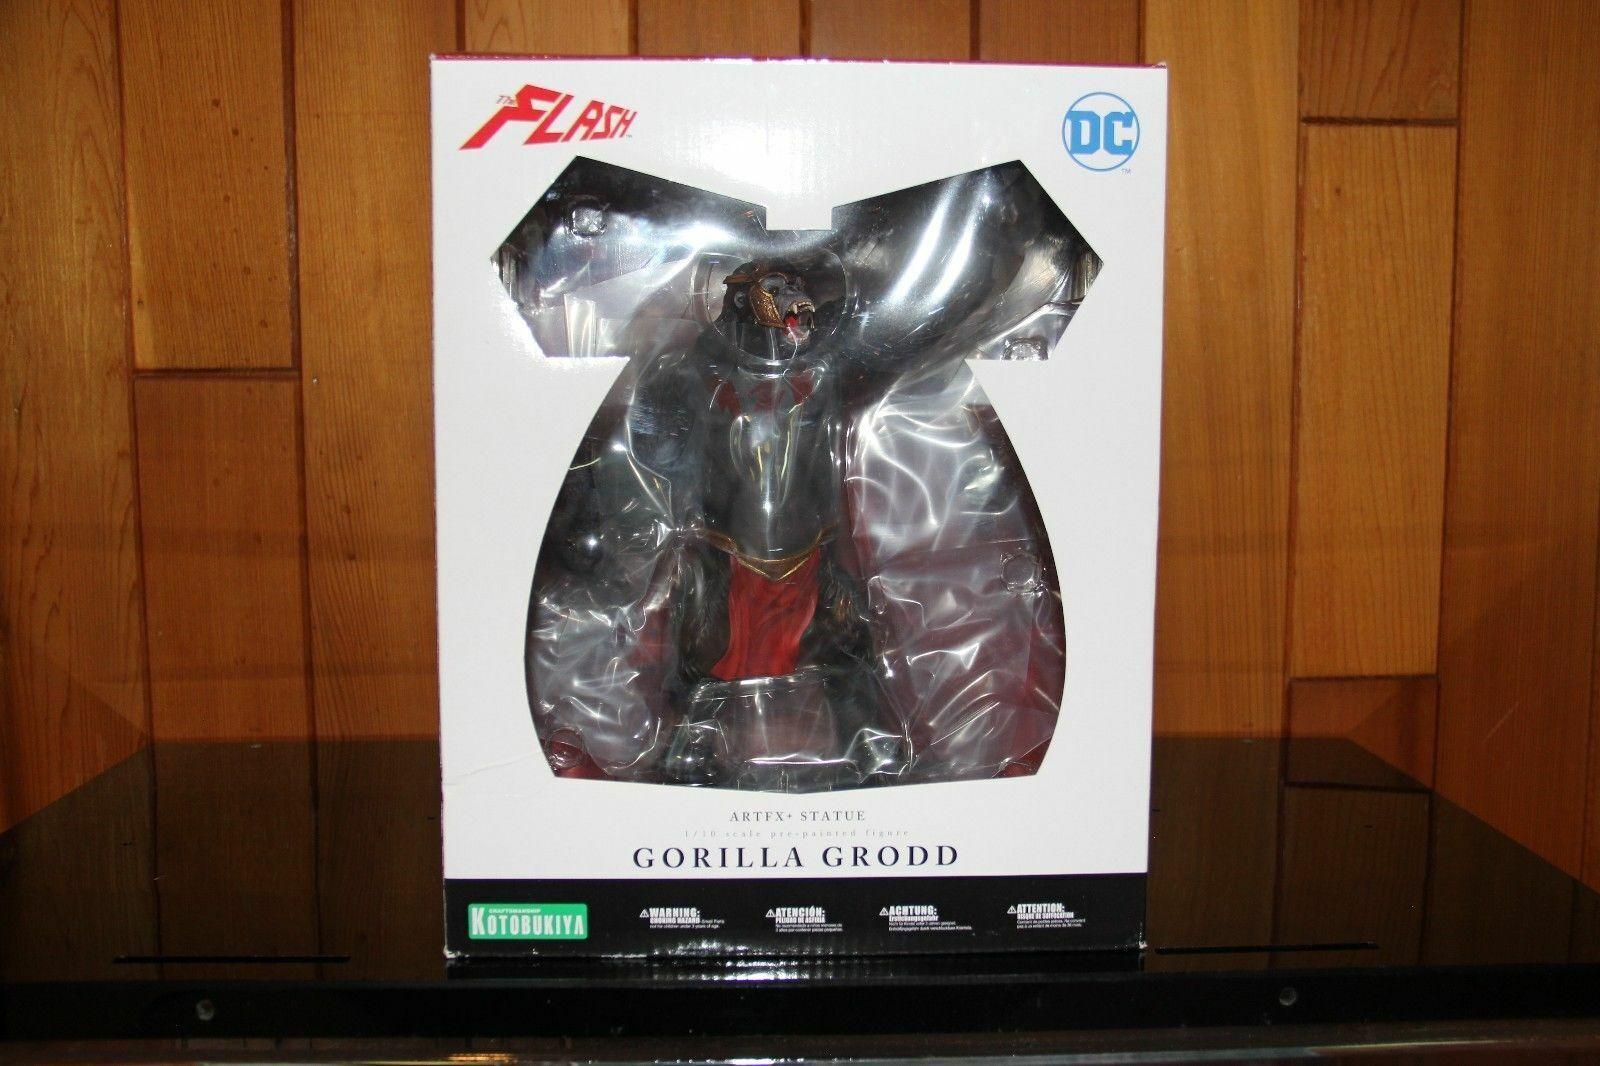 DC Comics Gorilla Grodd ArtFX+ 1 10 Scale Statue Kotobukiya